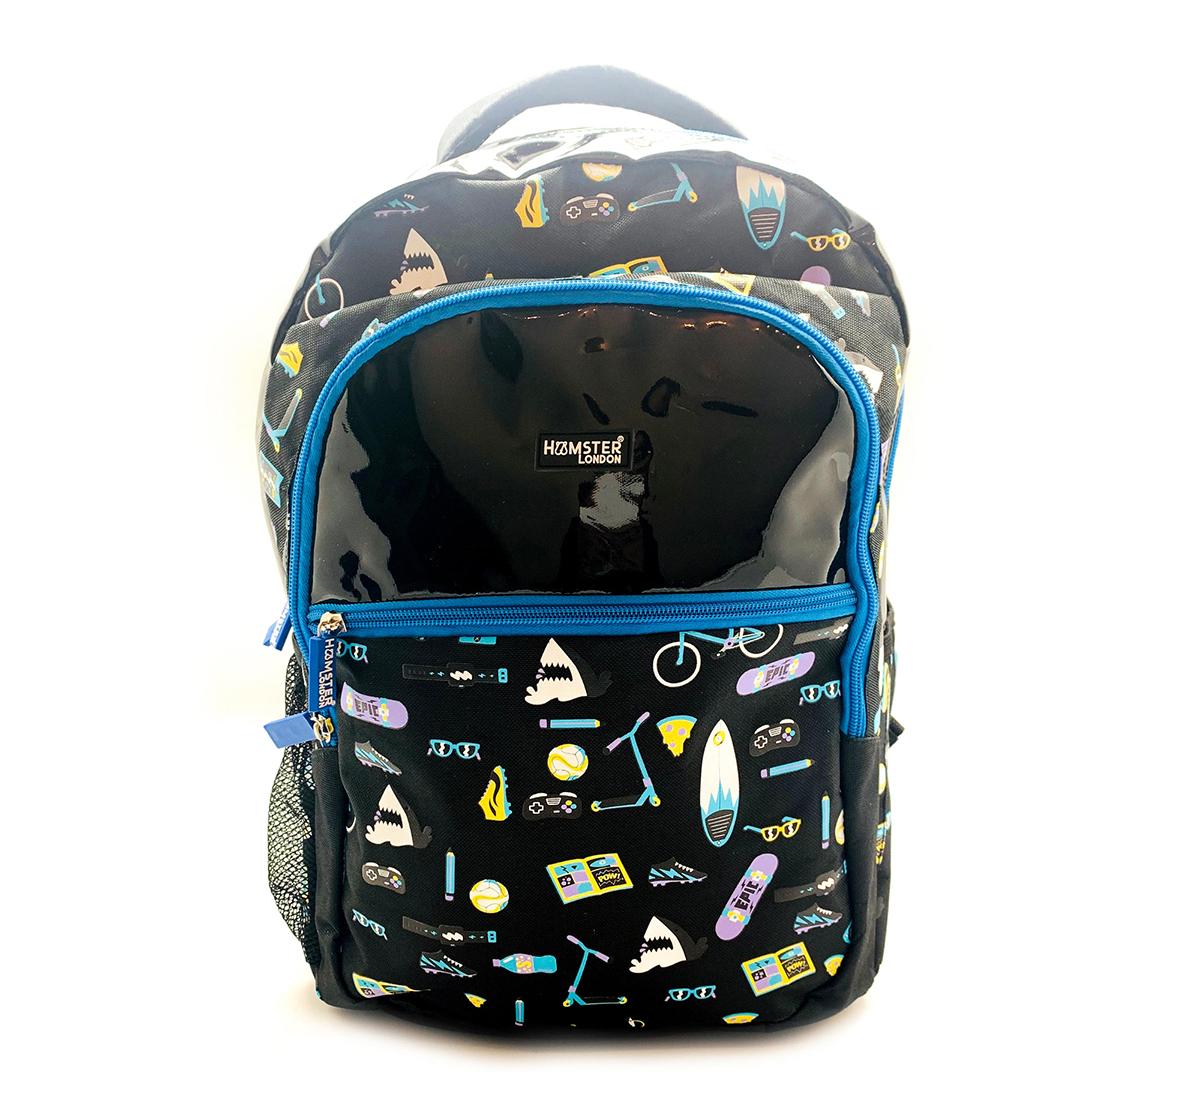 Hamster London | Hamster London Beach Theme Big Backpack for Boys age 3Y+ (Black)